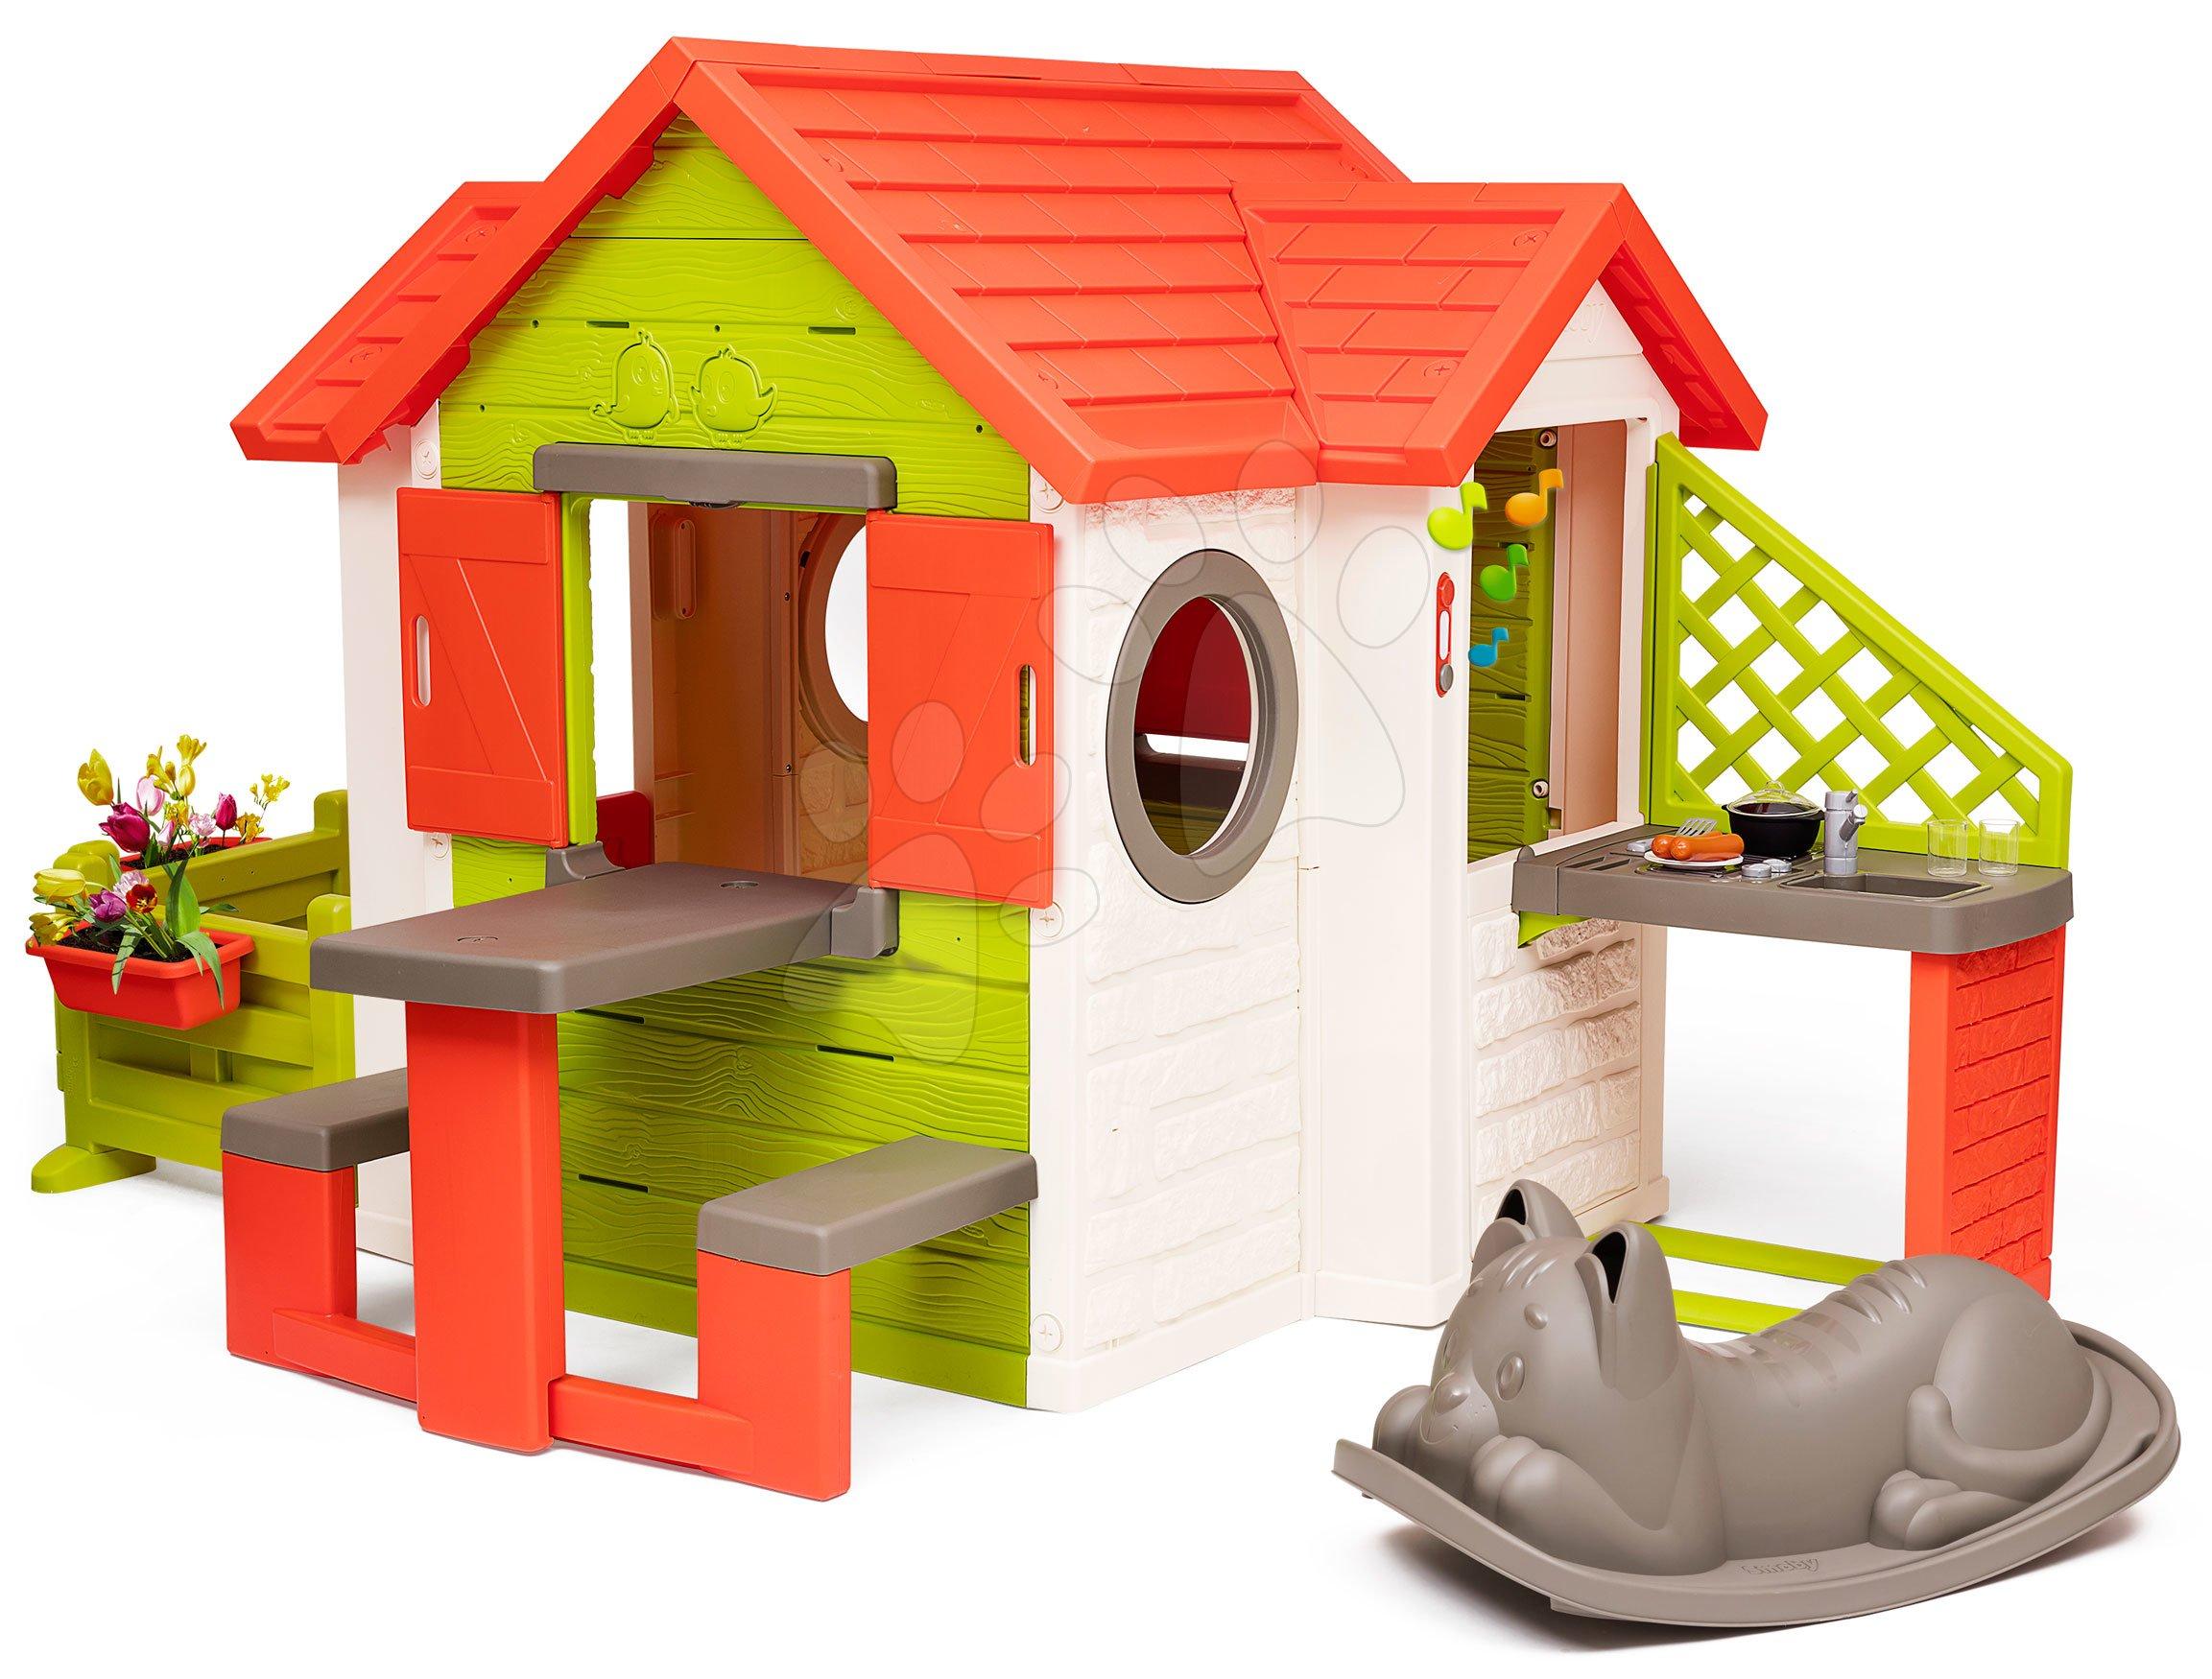 Domček My Neo House DeLuxe Smoby s nadstavbovým riešením a hojdačkou